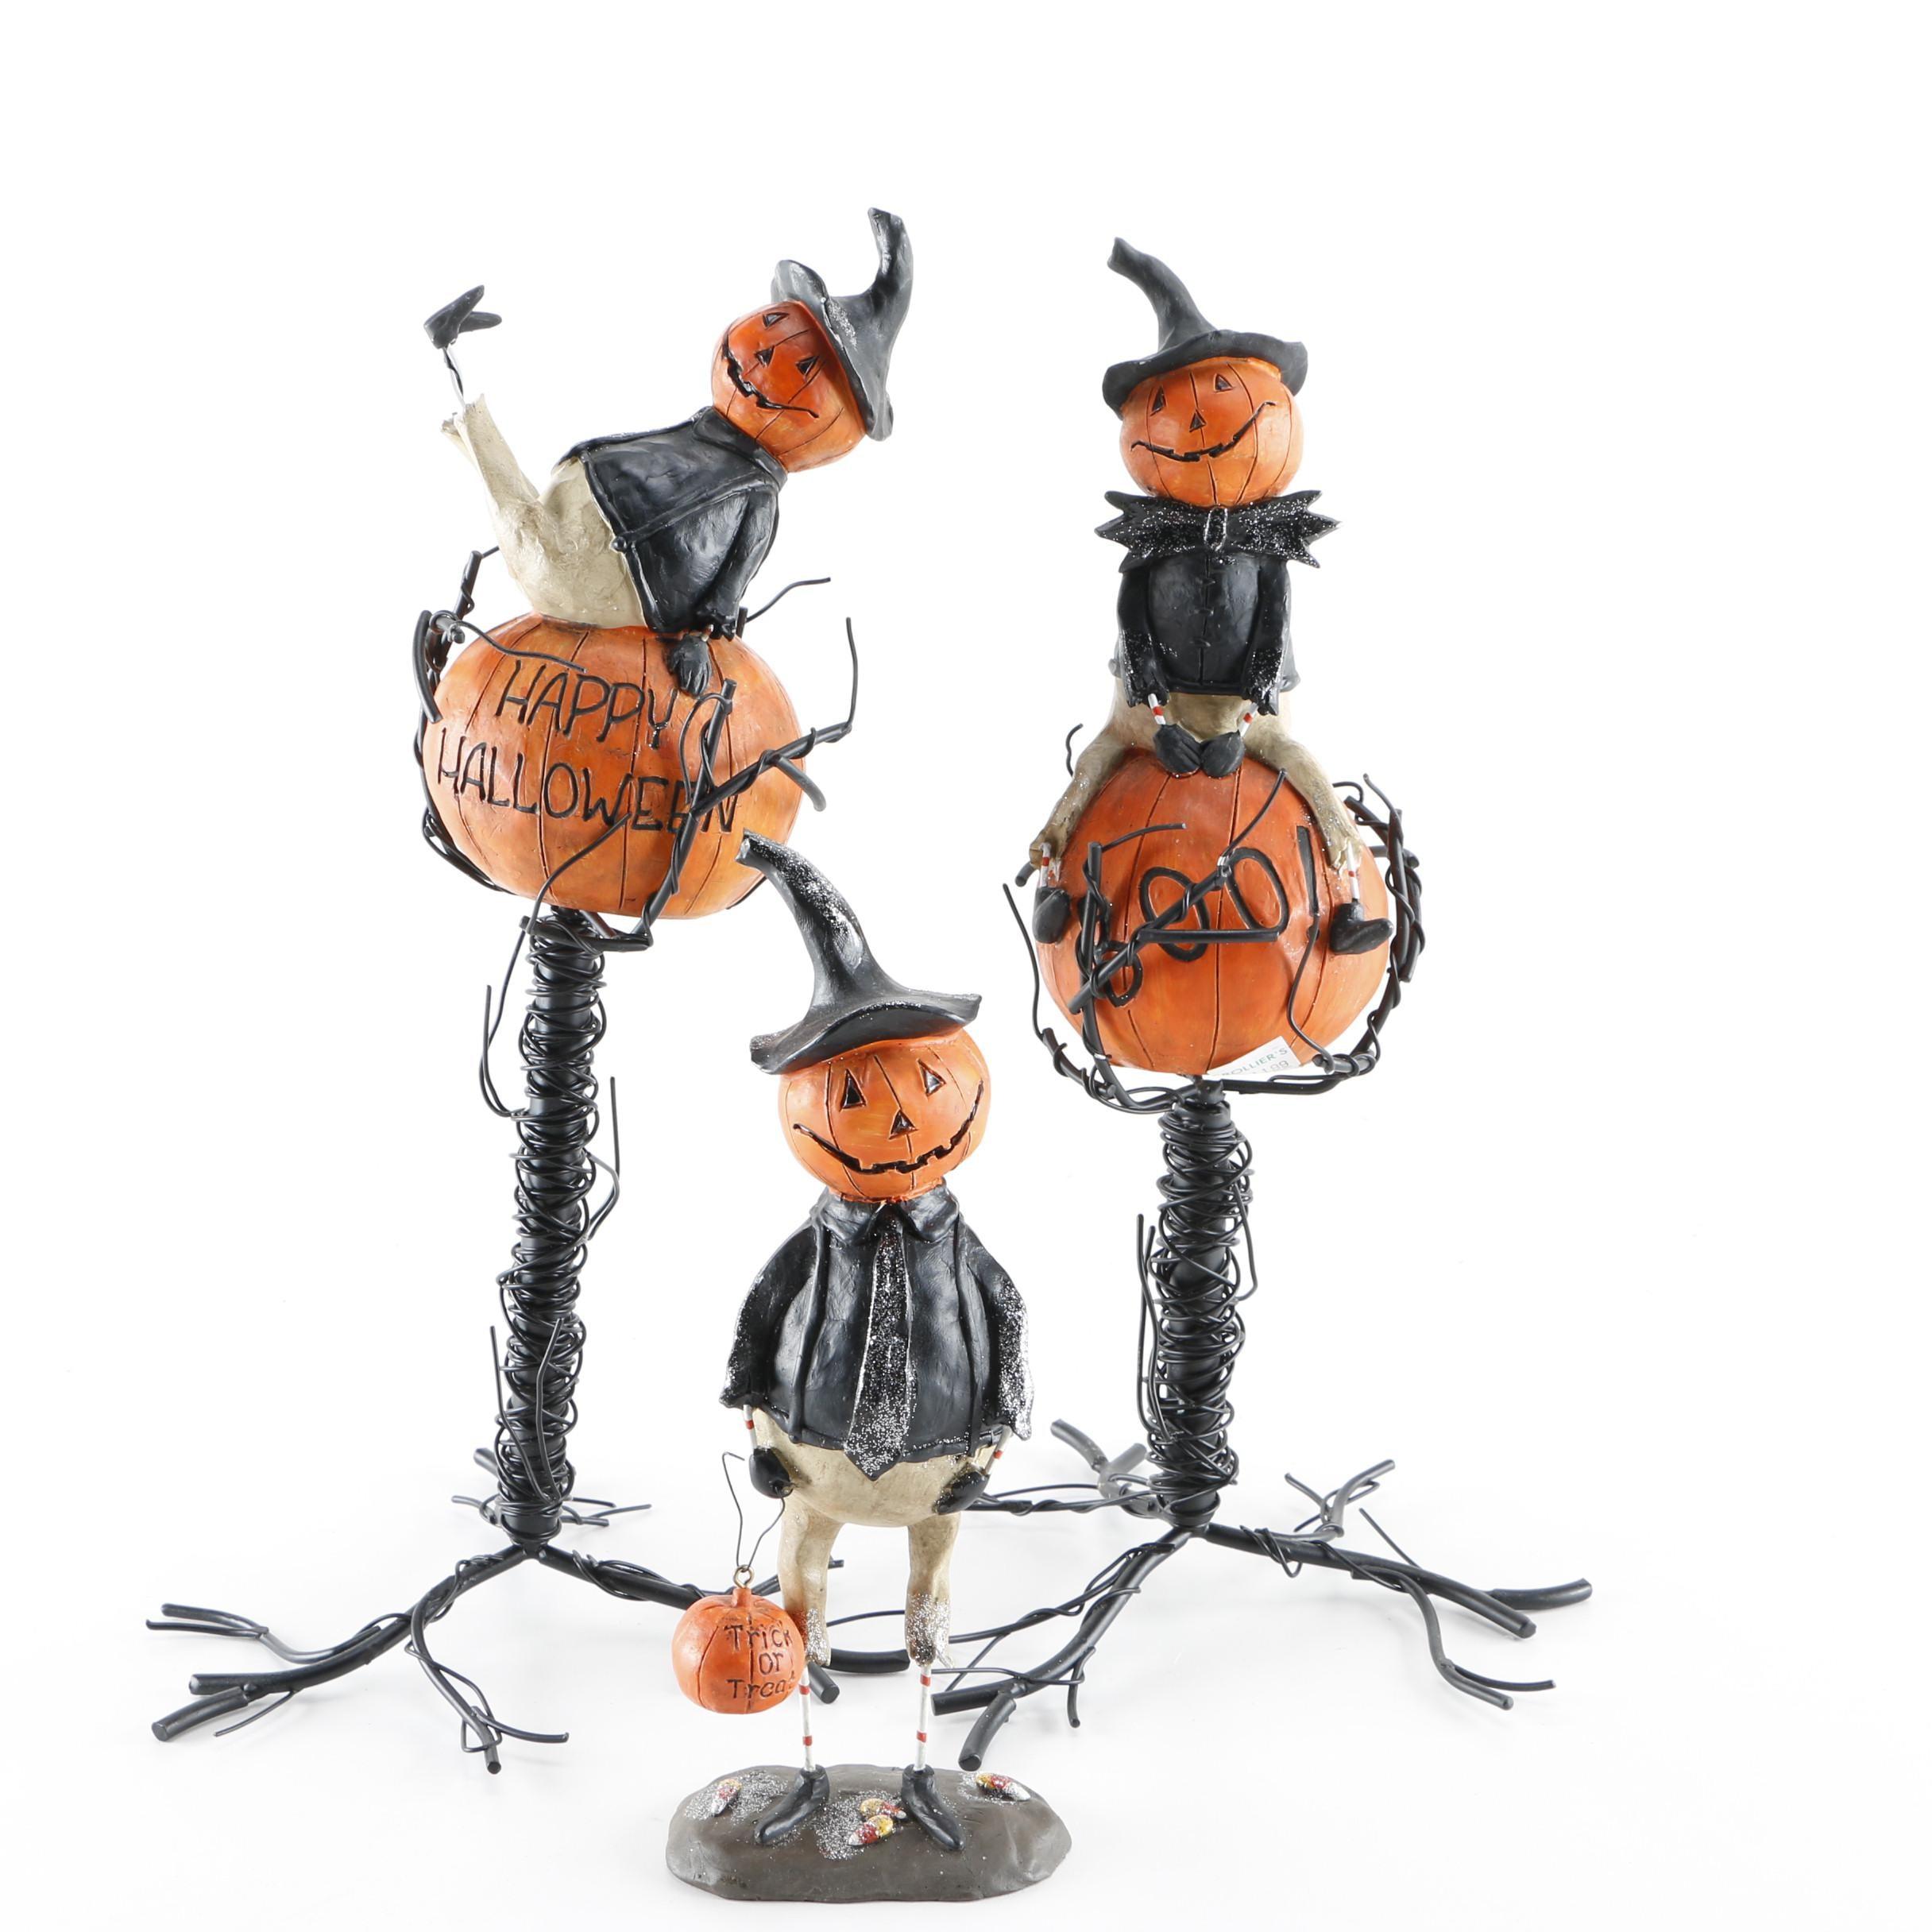 Wire Sculpture Jack-O-Lantern Figurines